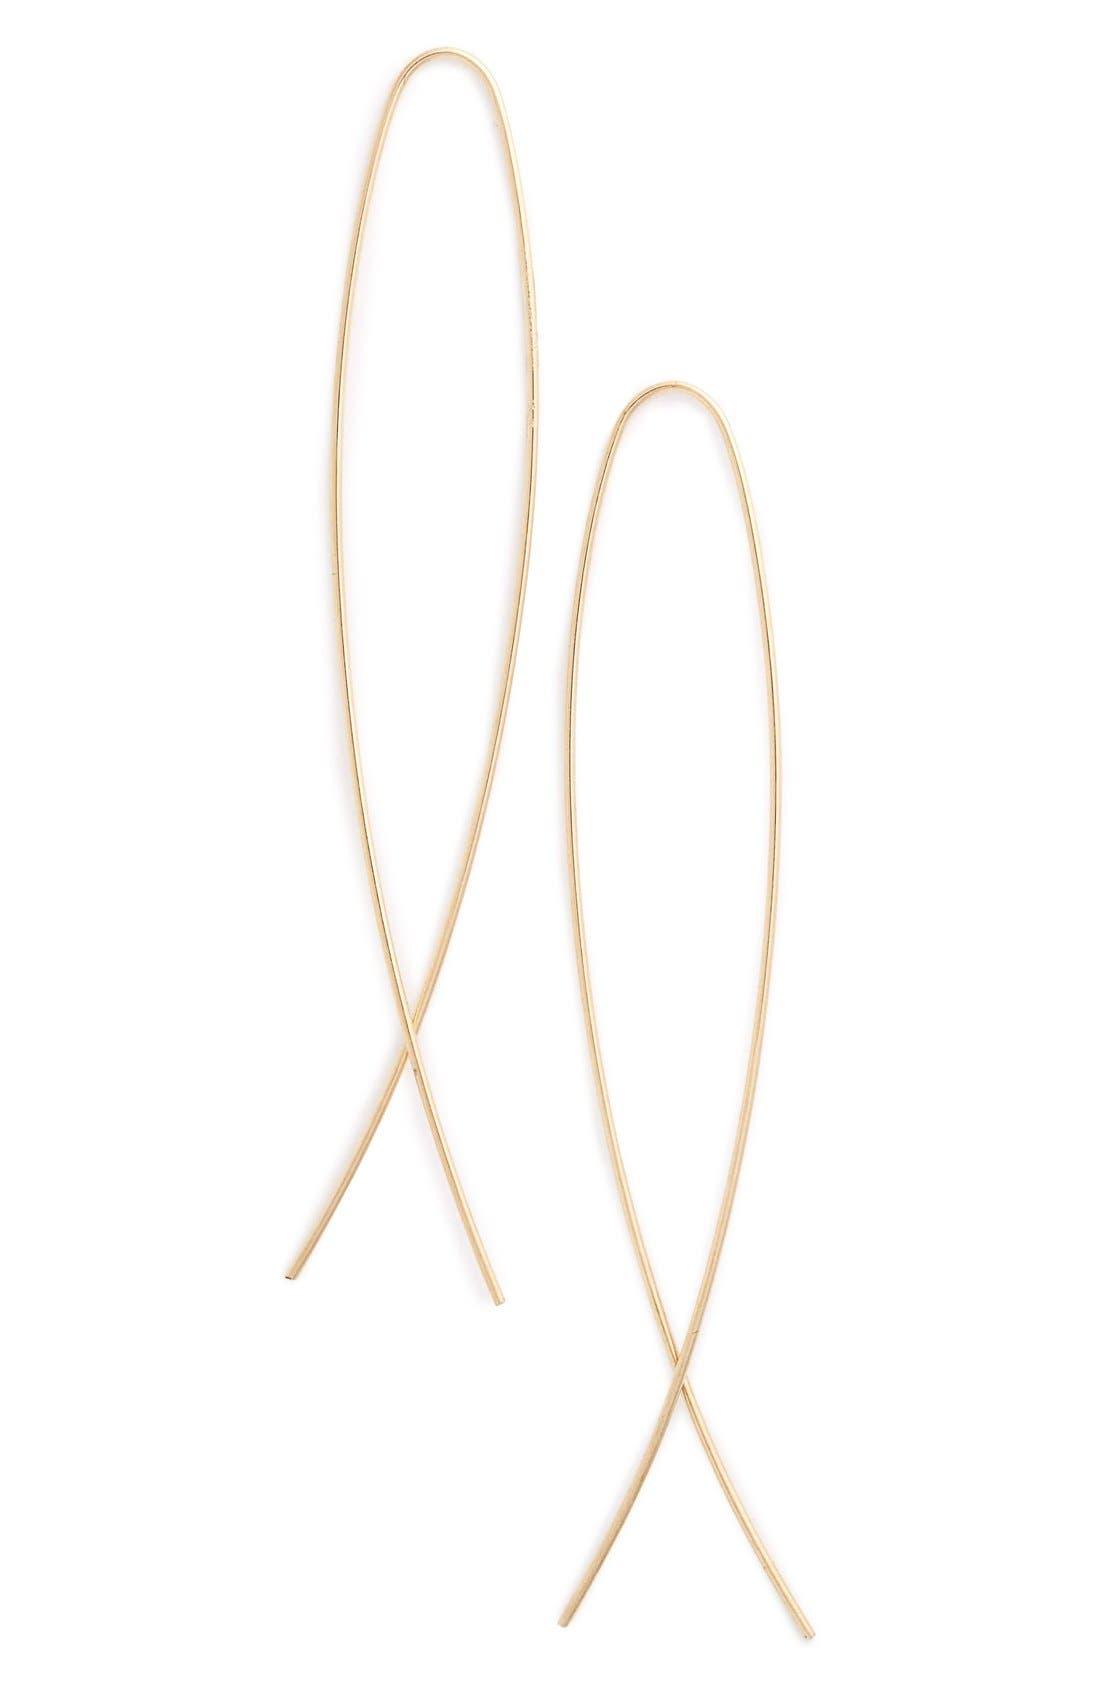 Main Image - Lana JewelryNarrow Wire Earrings